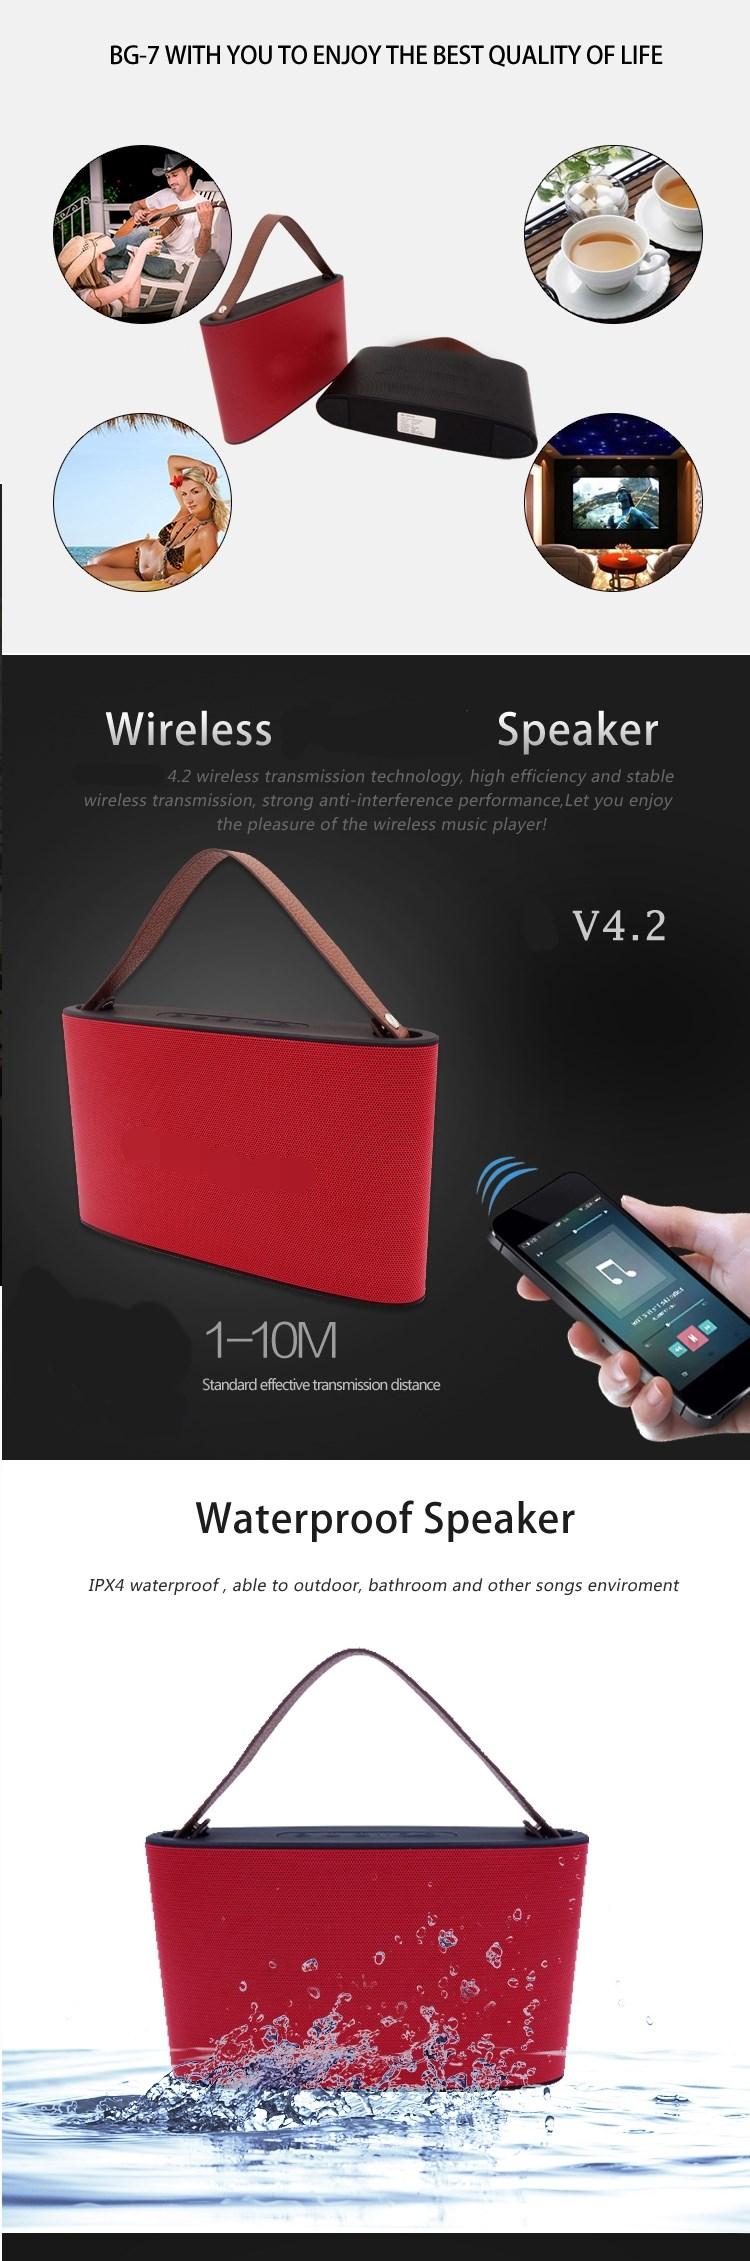 CET-DR03 Desain Eksklusif Suara Murni Portable Speaker Bluetooths Subwoofer